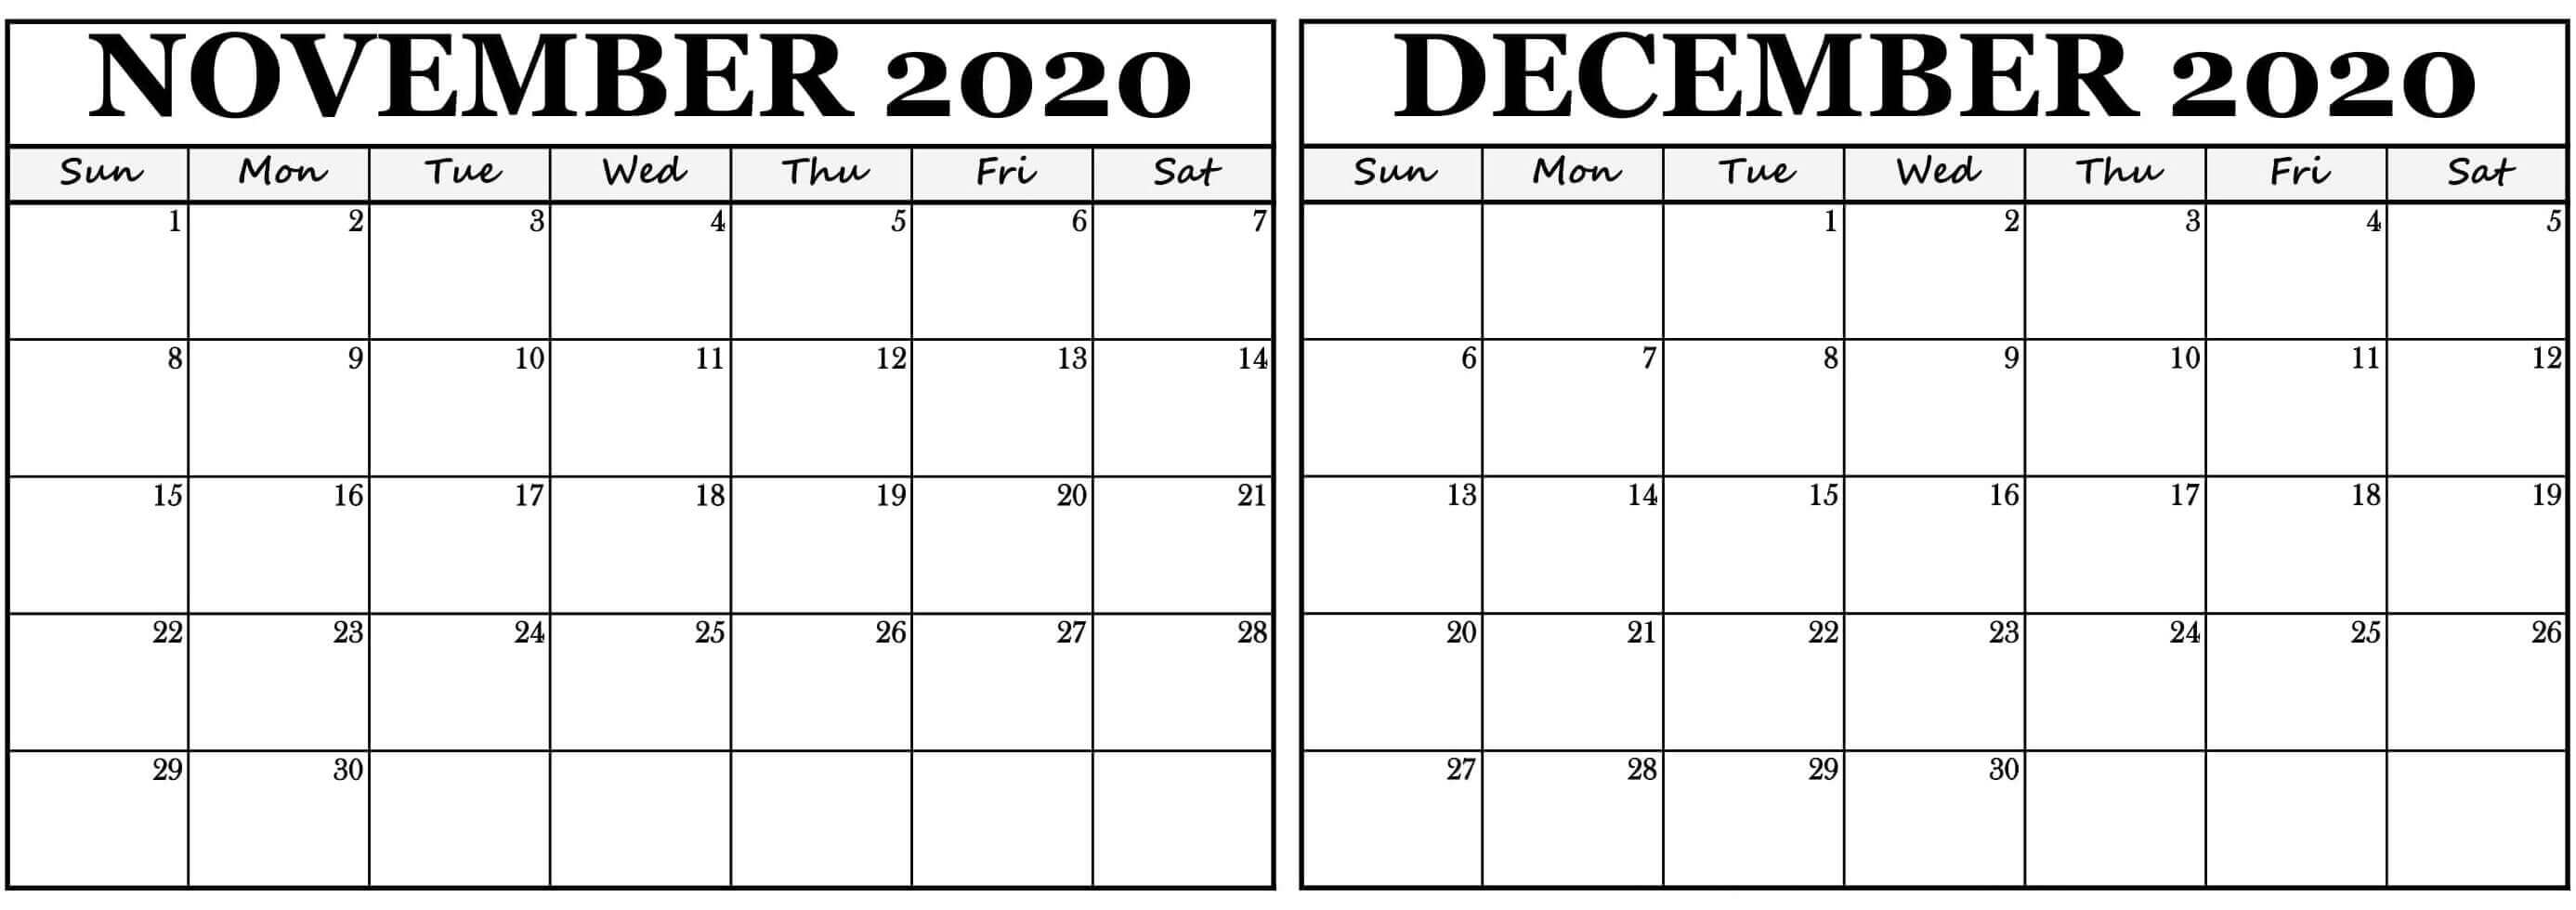 Editable November December 2020 Calendar Landscape